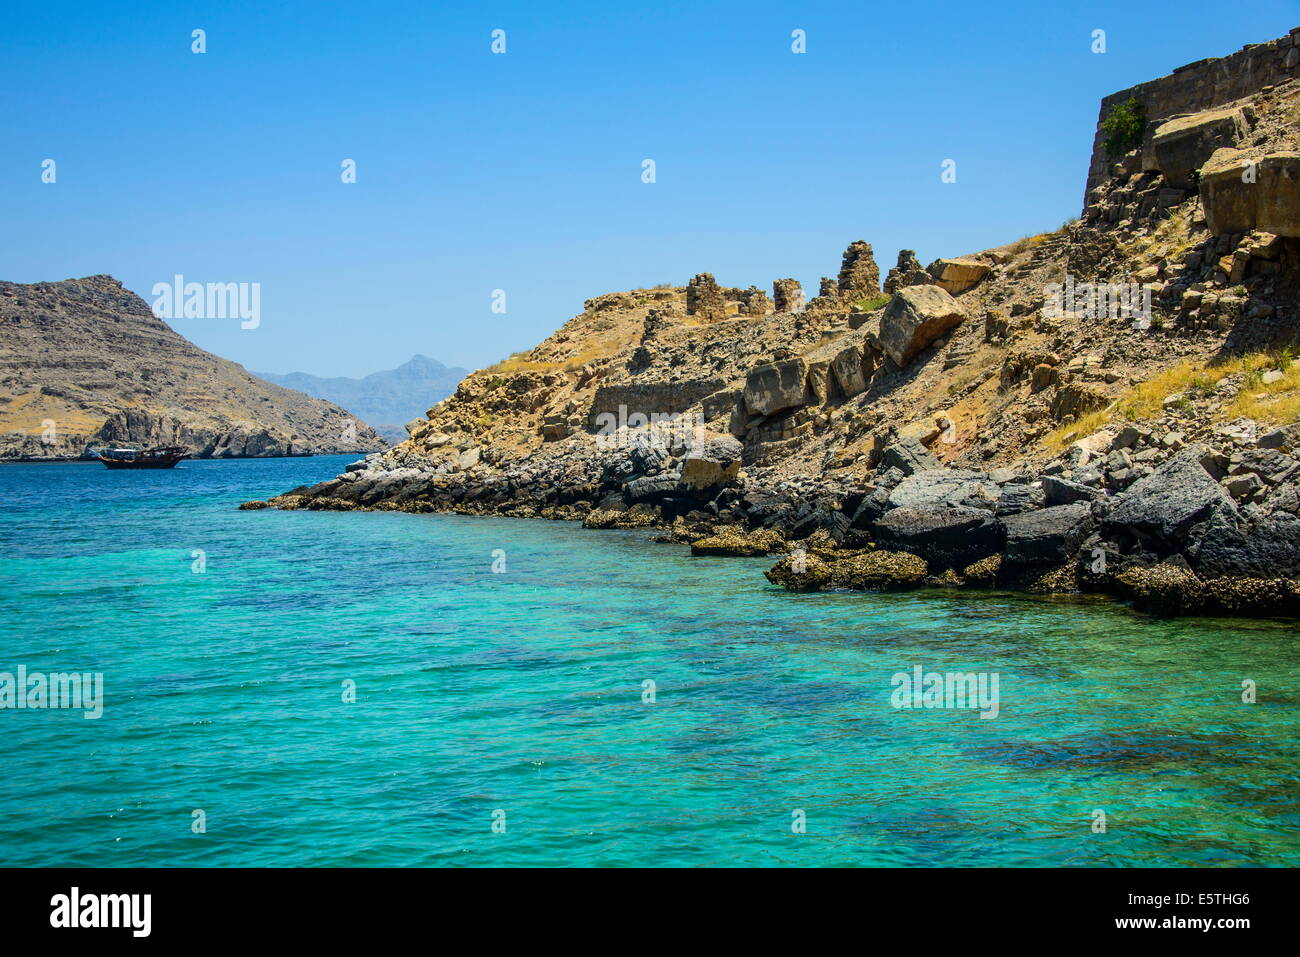 Telegraph Island dans le Khor ash-sham, fjord, Musandam Oman, Middle East Photo Stock